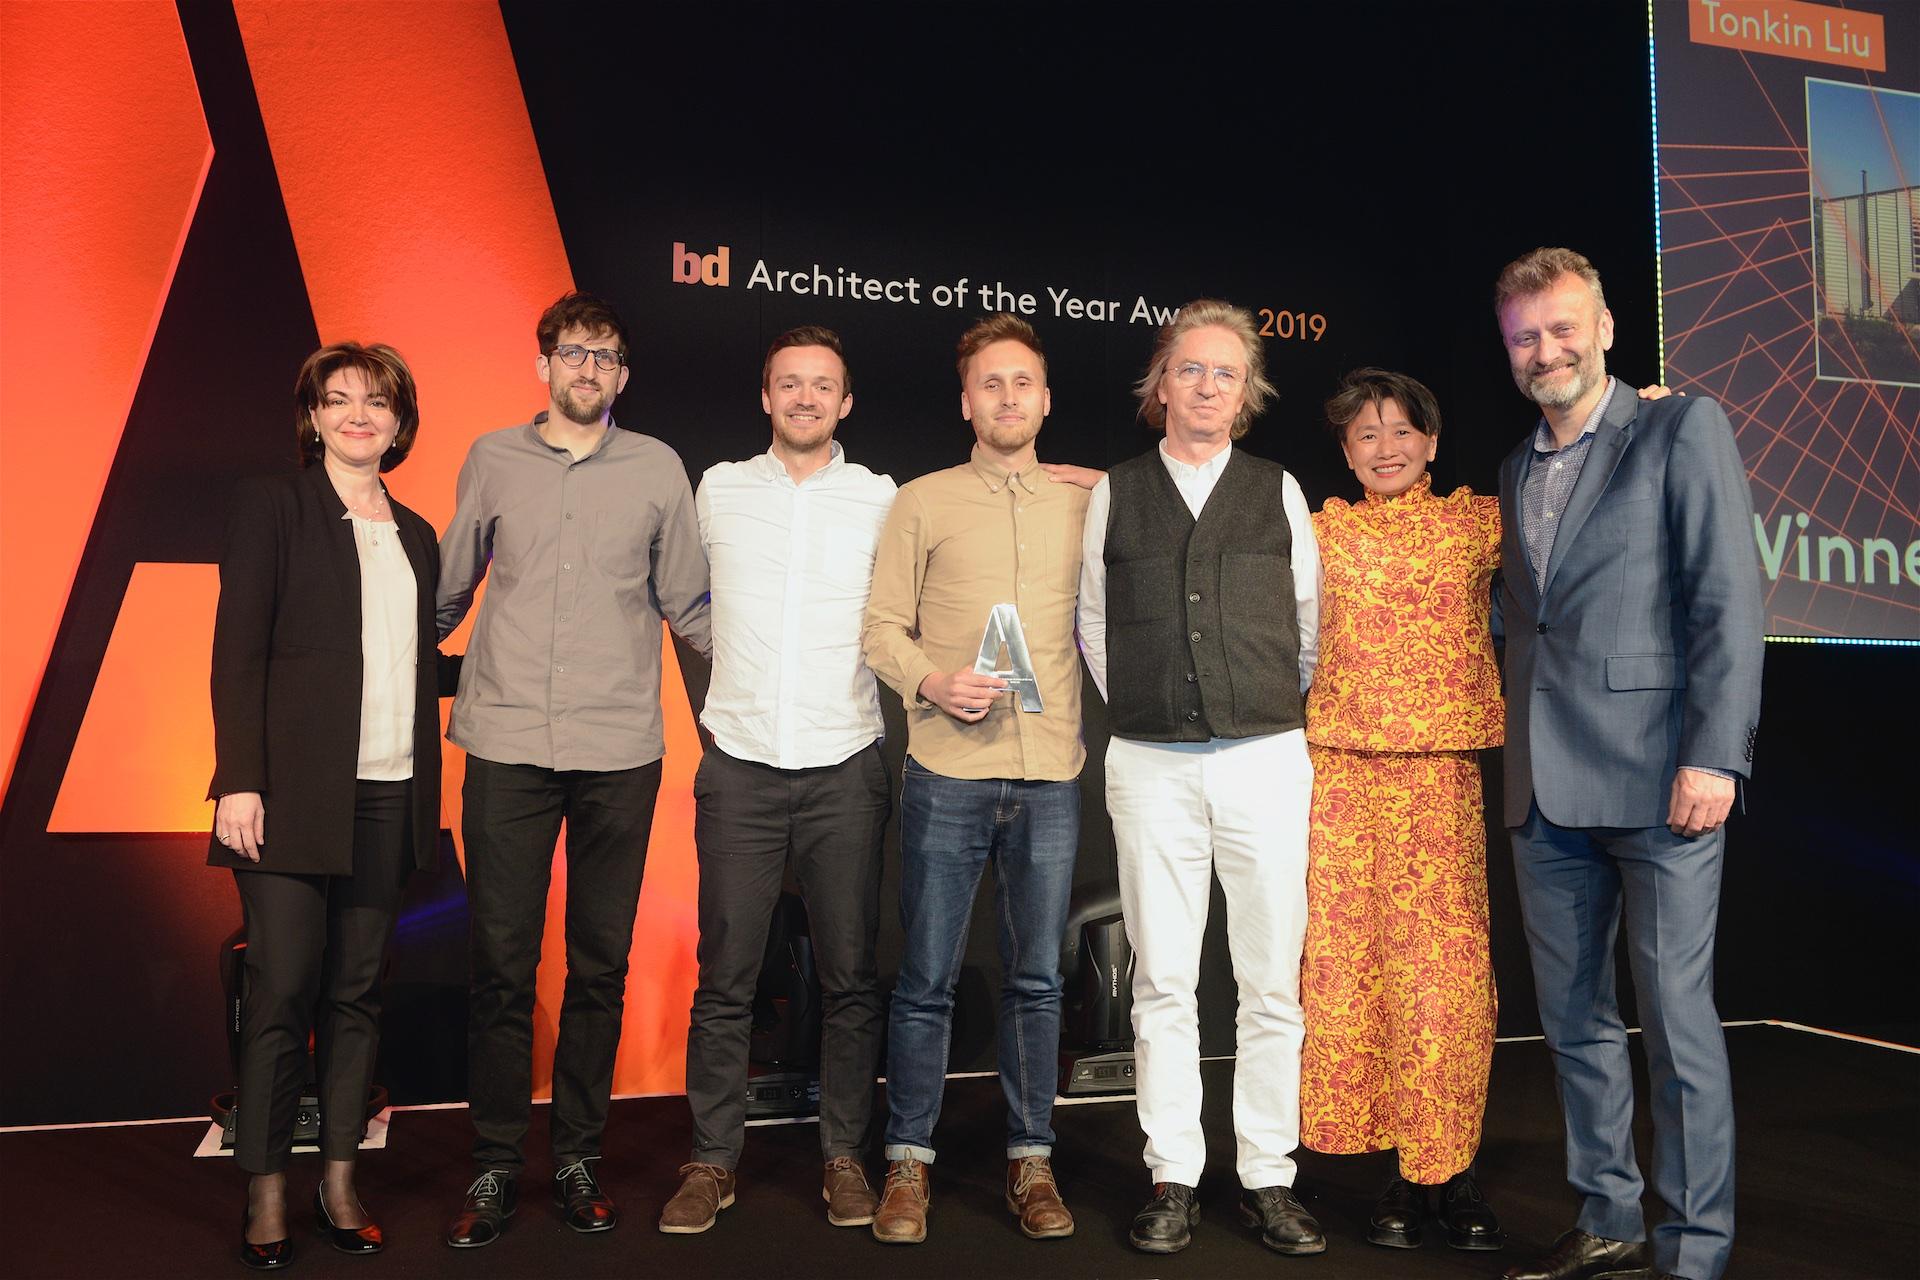 BD_Architect_of_The_Year_Tonkin_Liu_Award